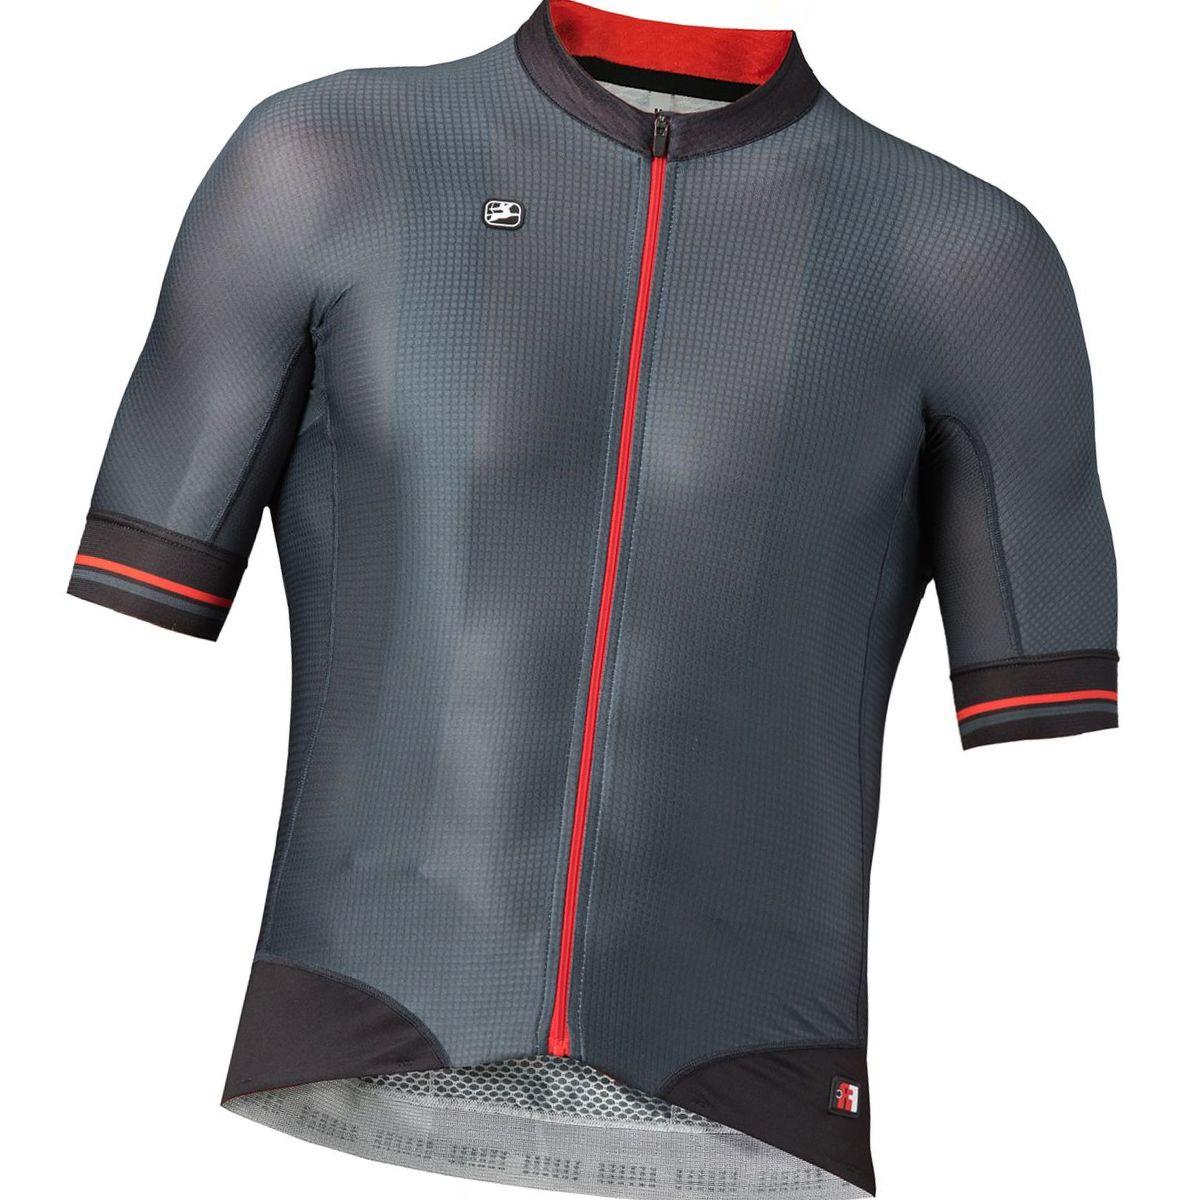 Giordana FR-C Pro Short-Sleeve Jersey - Men's